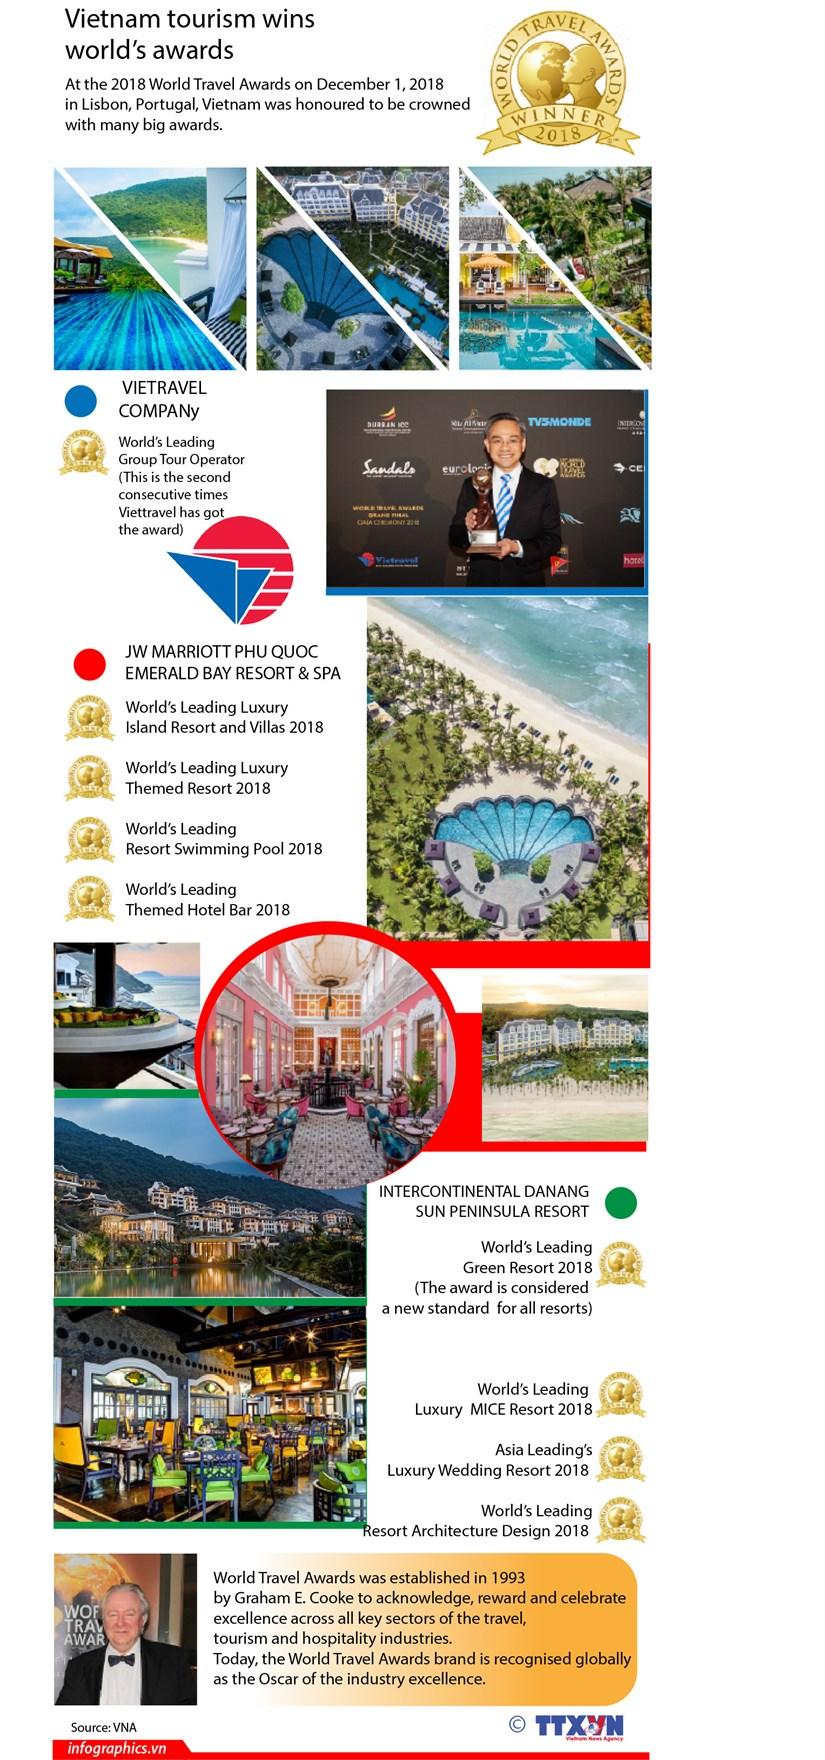 Vietnam tourism wins world's awards hinh anh 1